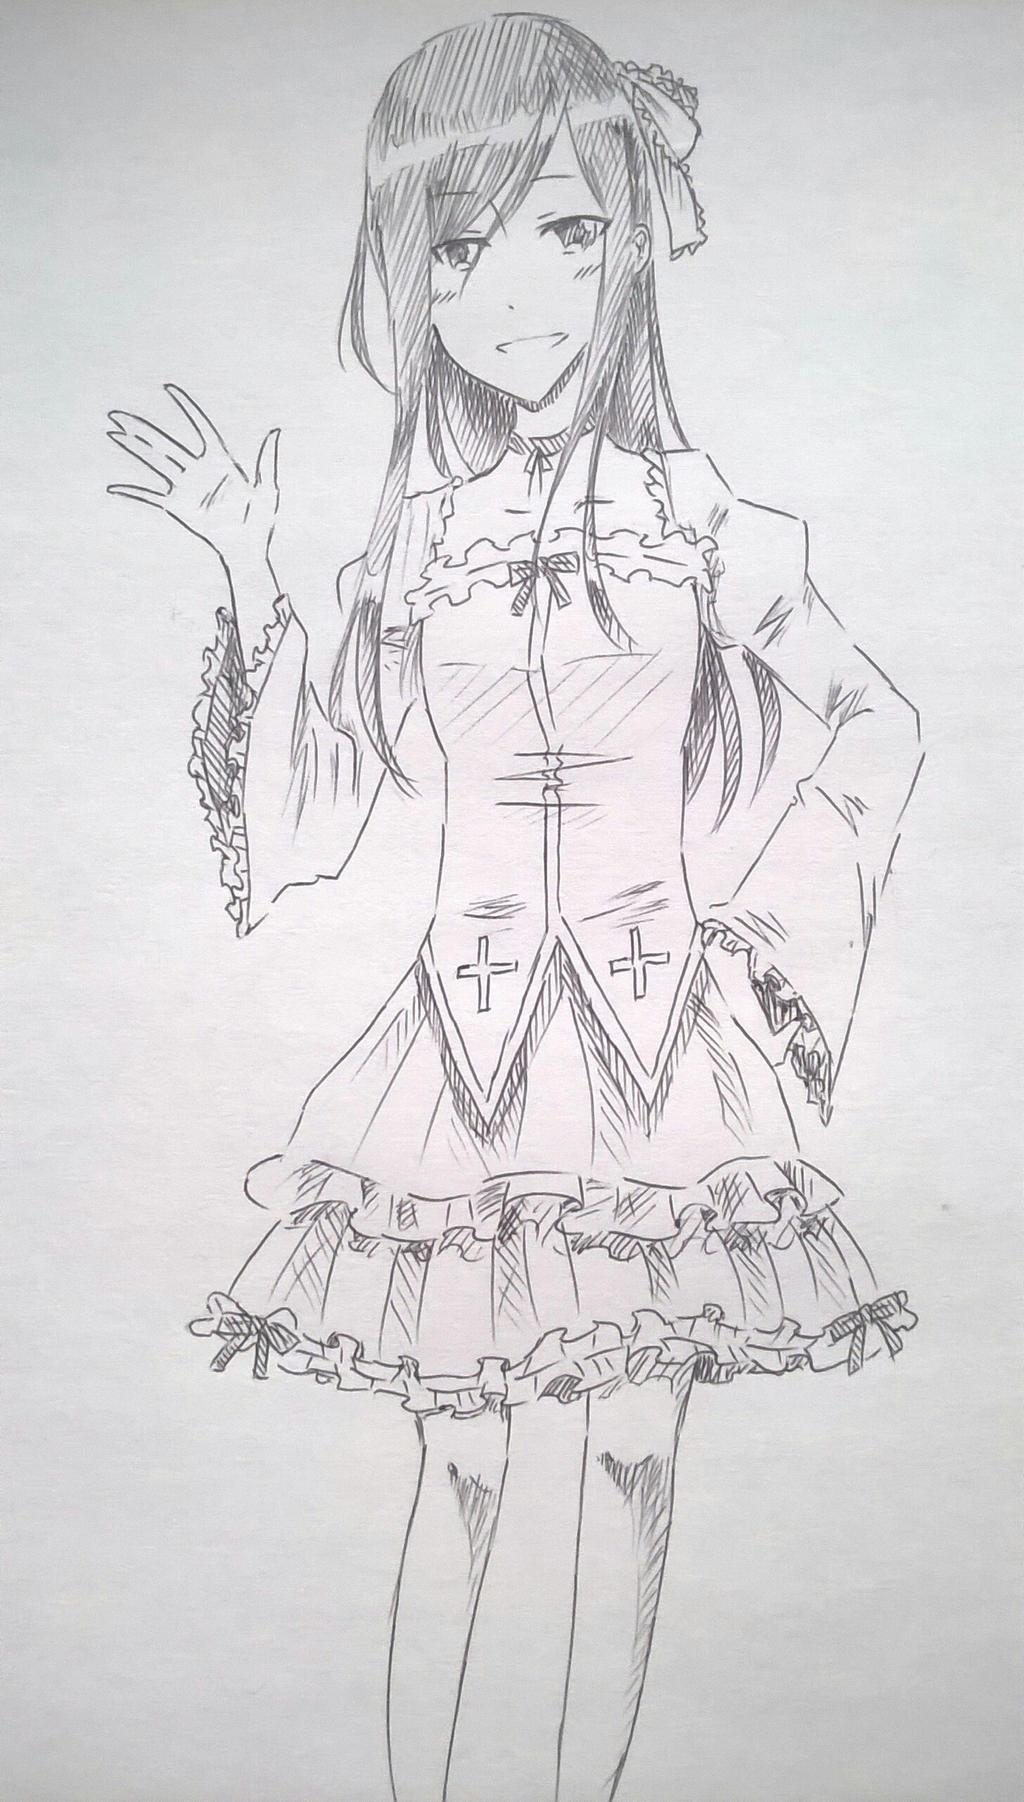 Goth loli outfit by Kamikoroshu